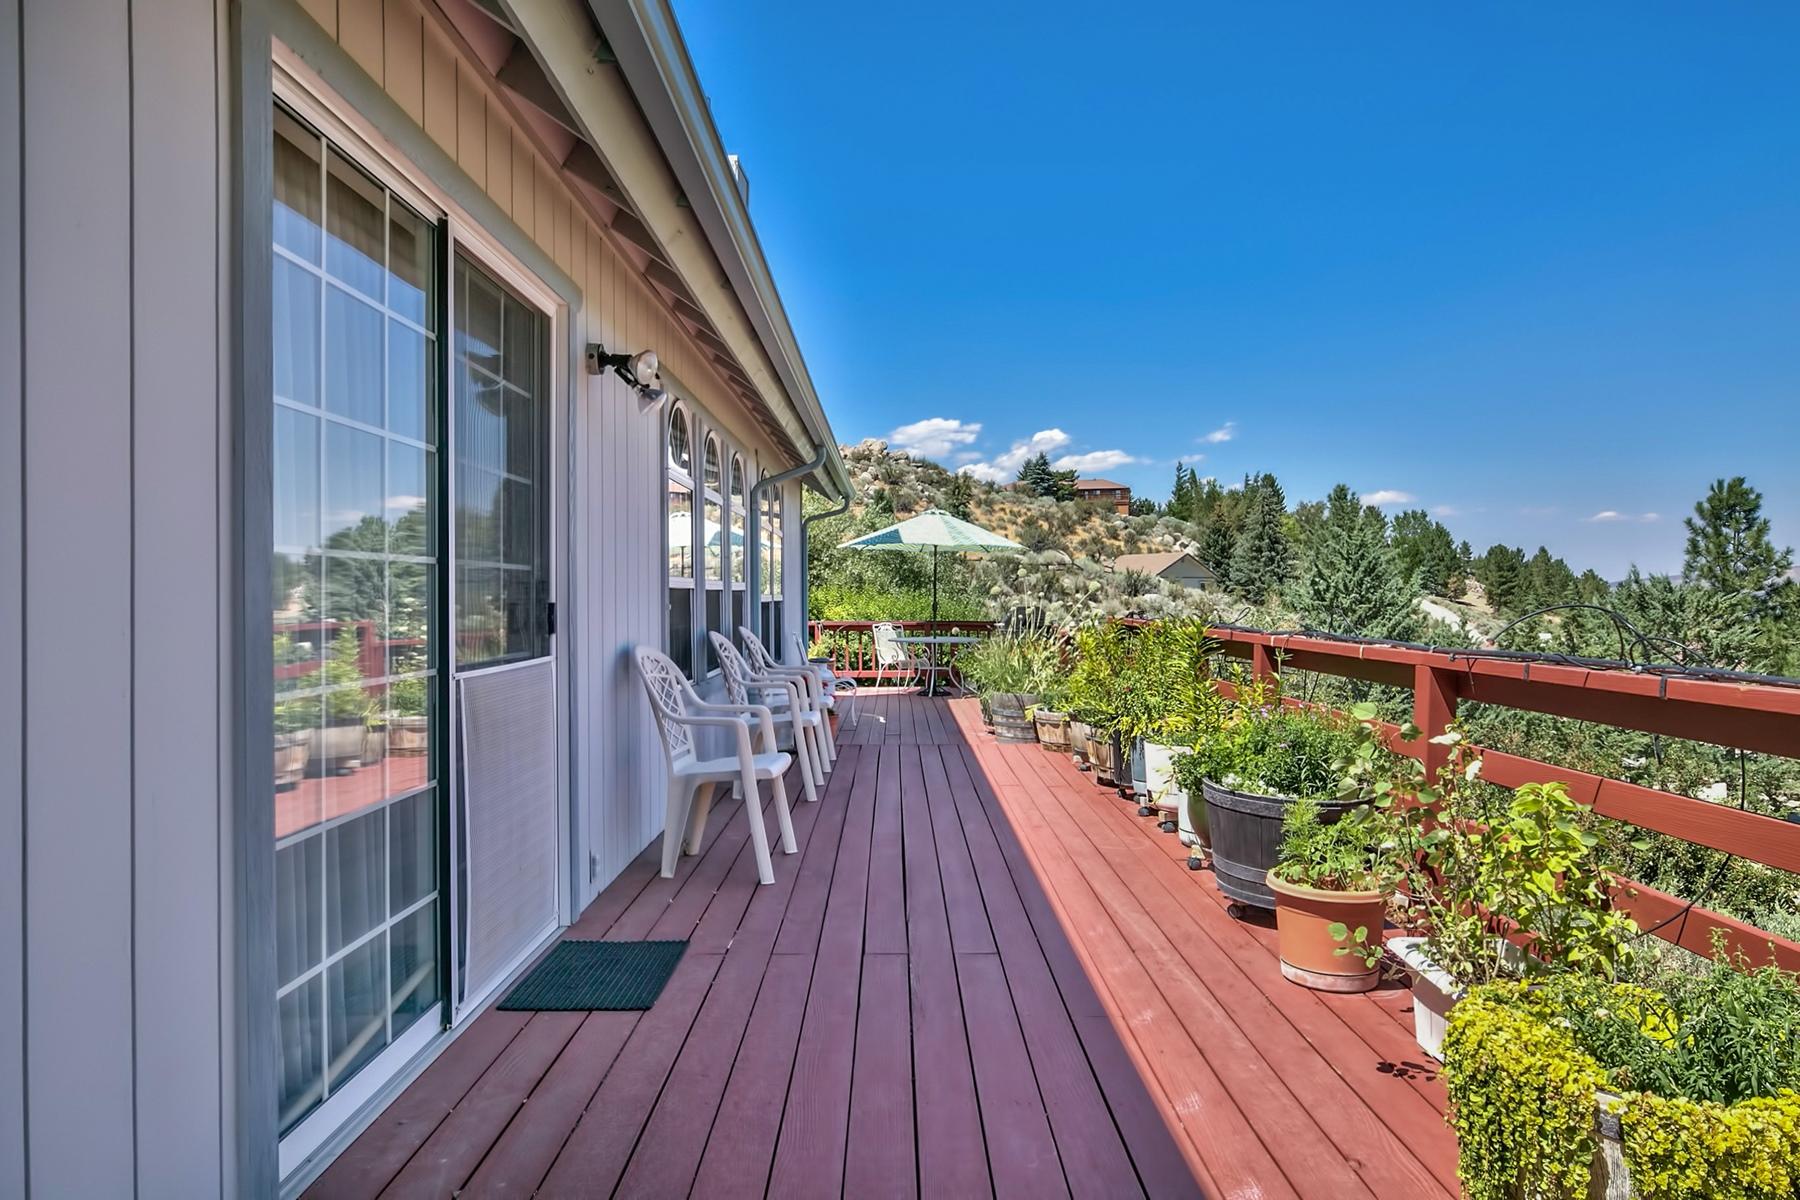 Single Family Home for Rent at 4731 Fox Creek Carson City, Nevada Carson City, Nevada 89703 United States